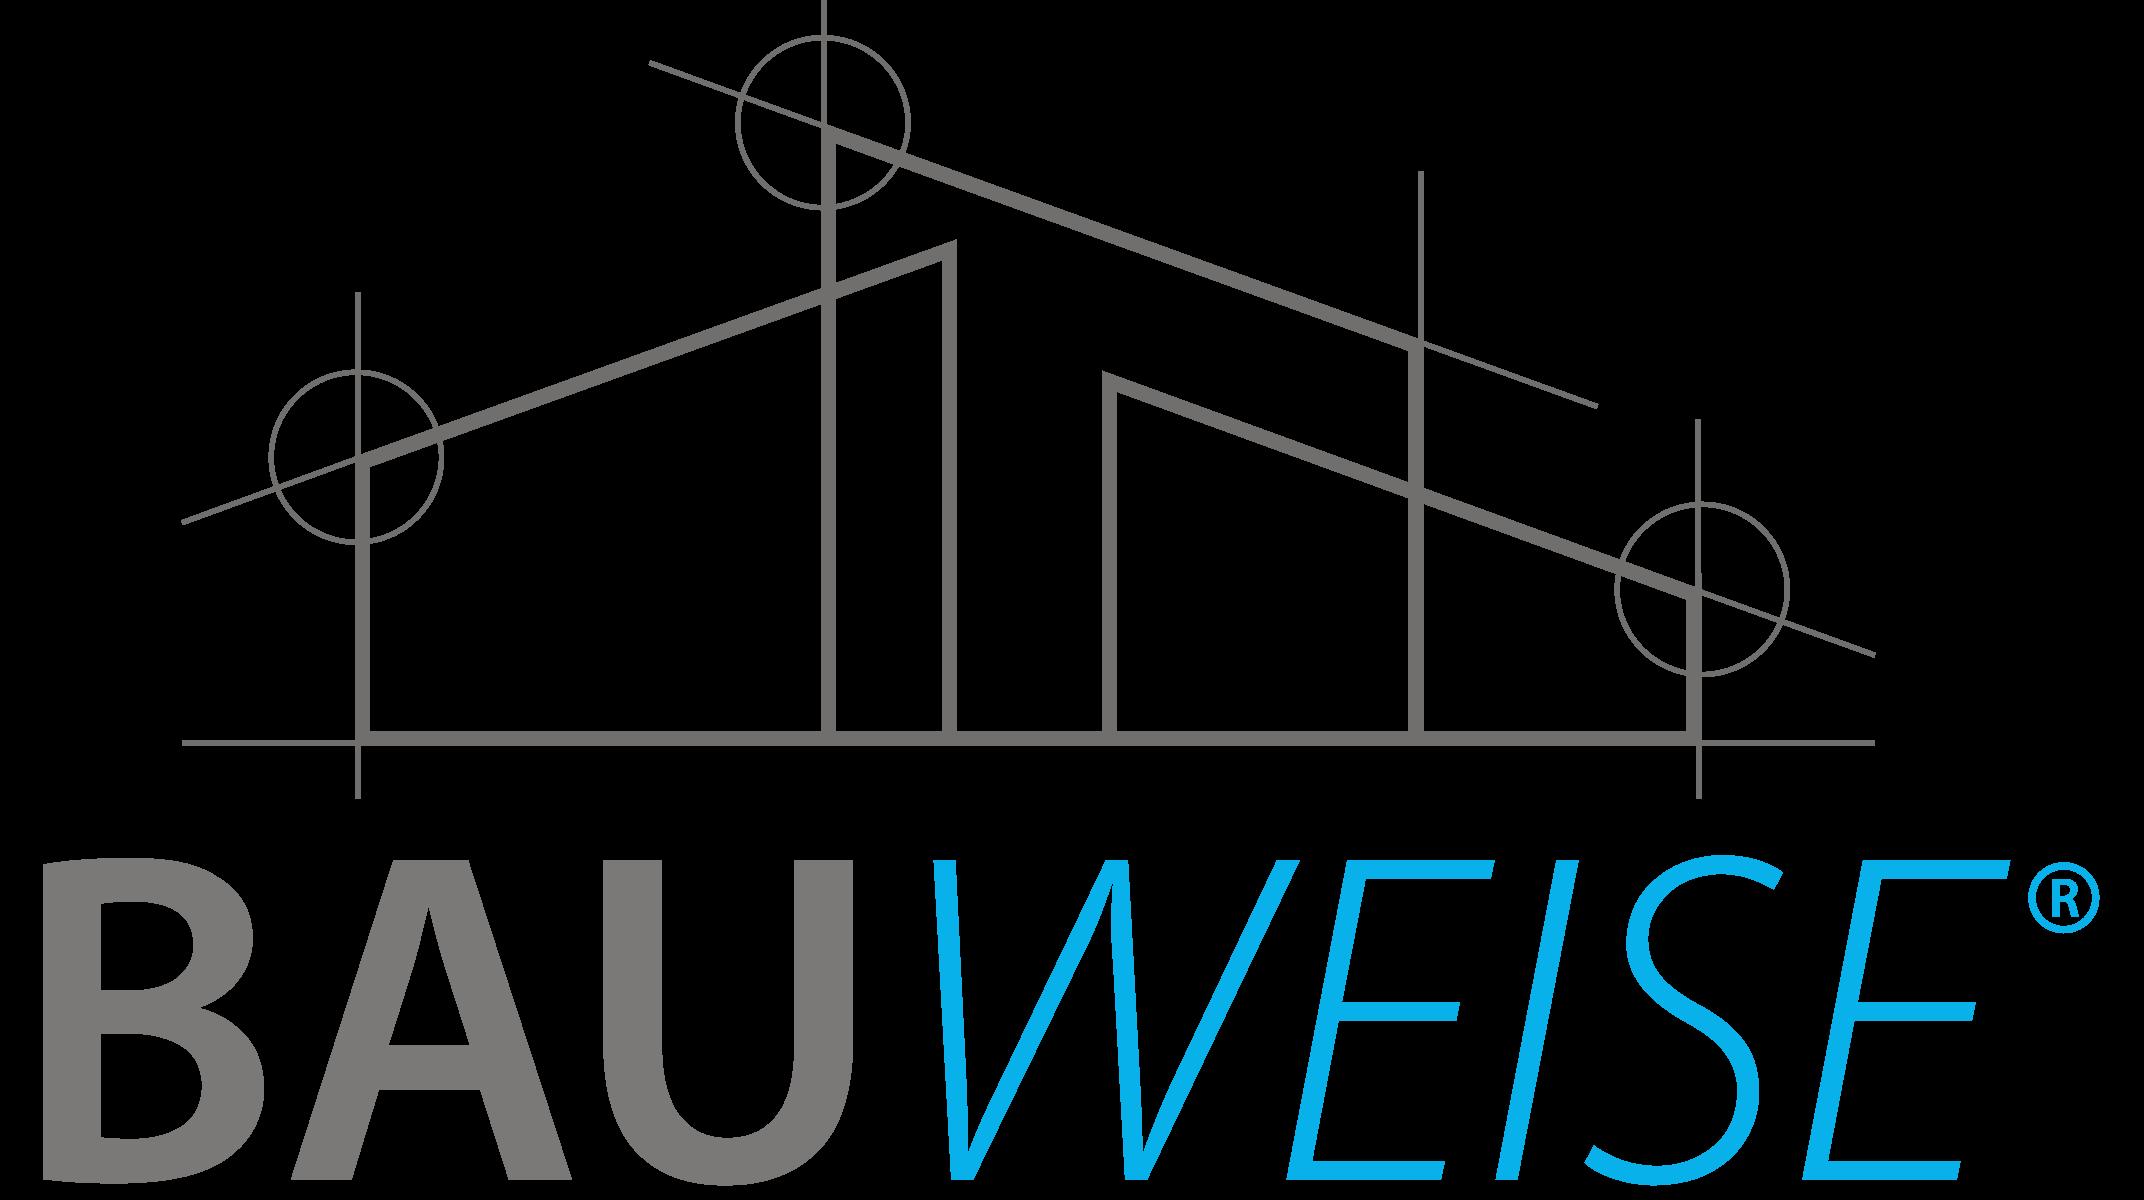 Bauweise Architektur logo